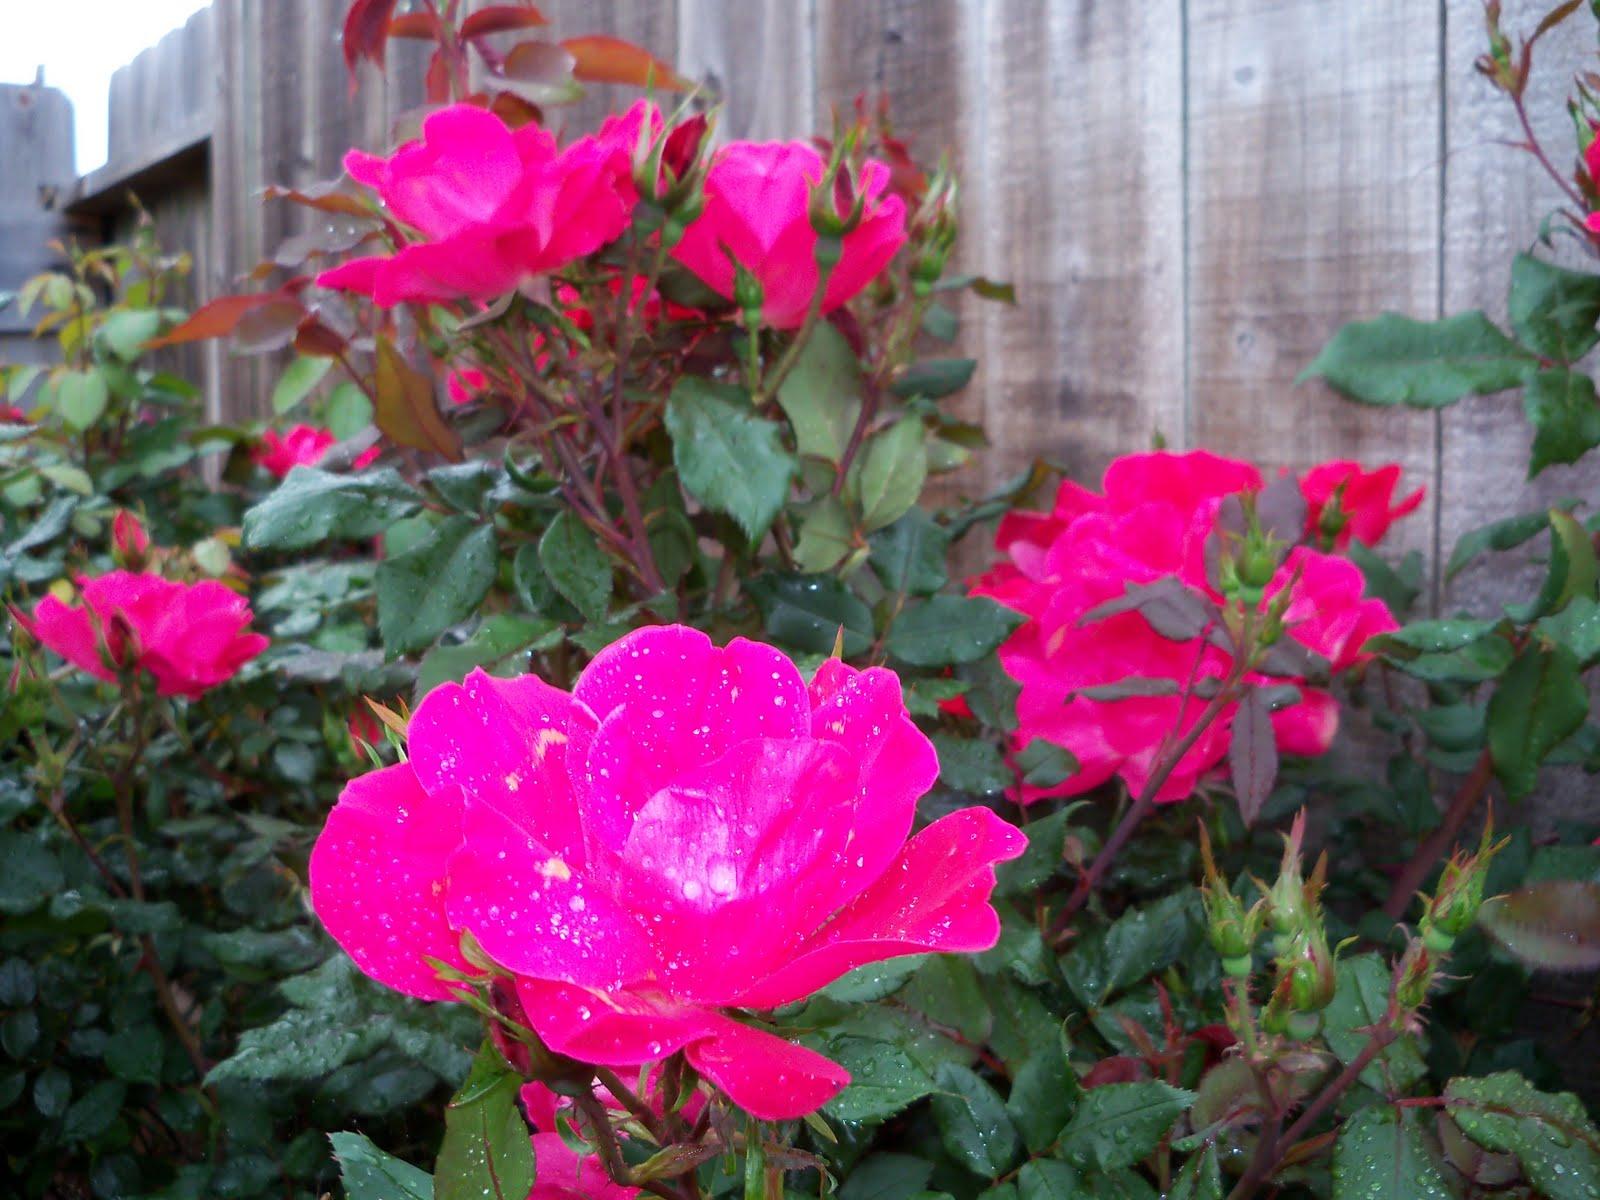 Gardening 2010 - 101_0529.JPG